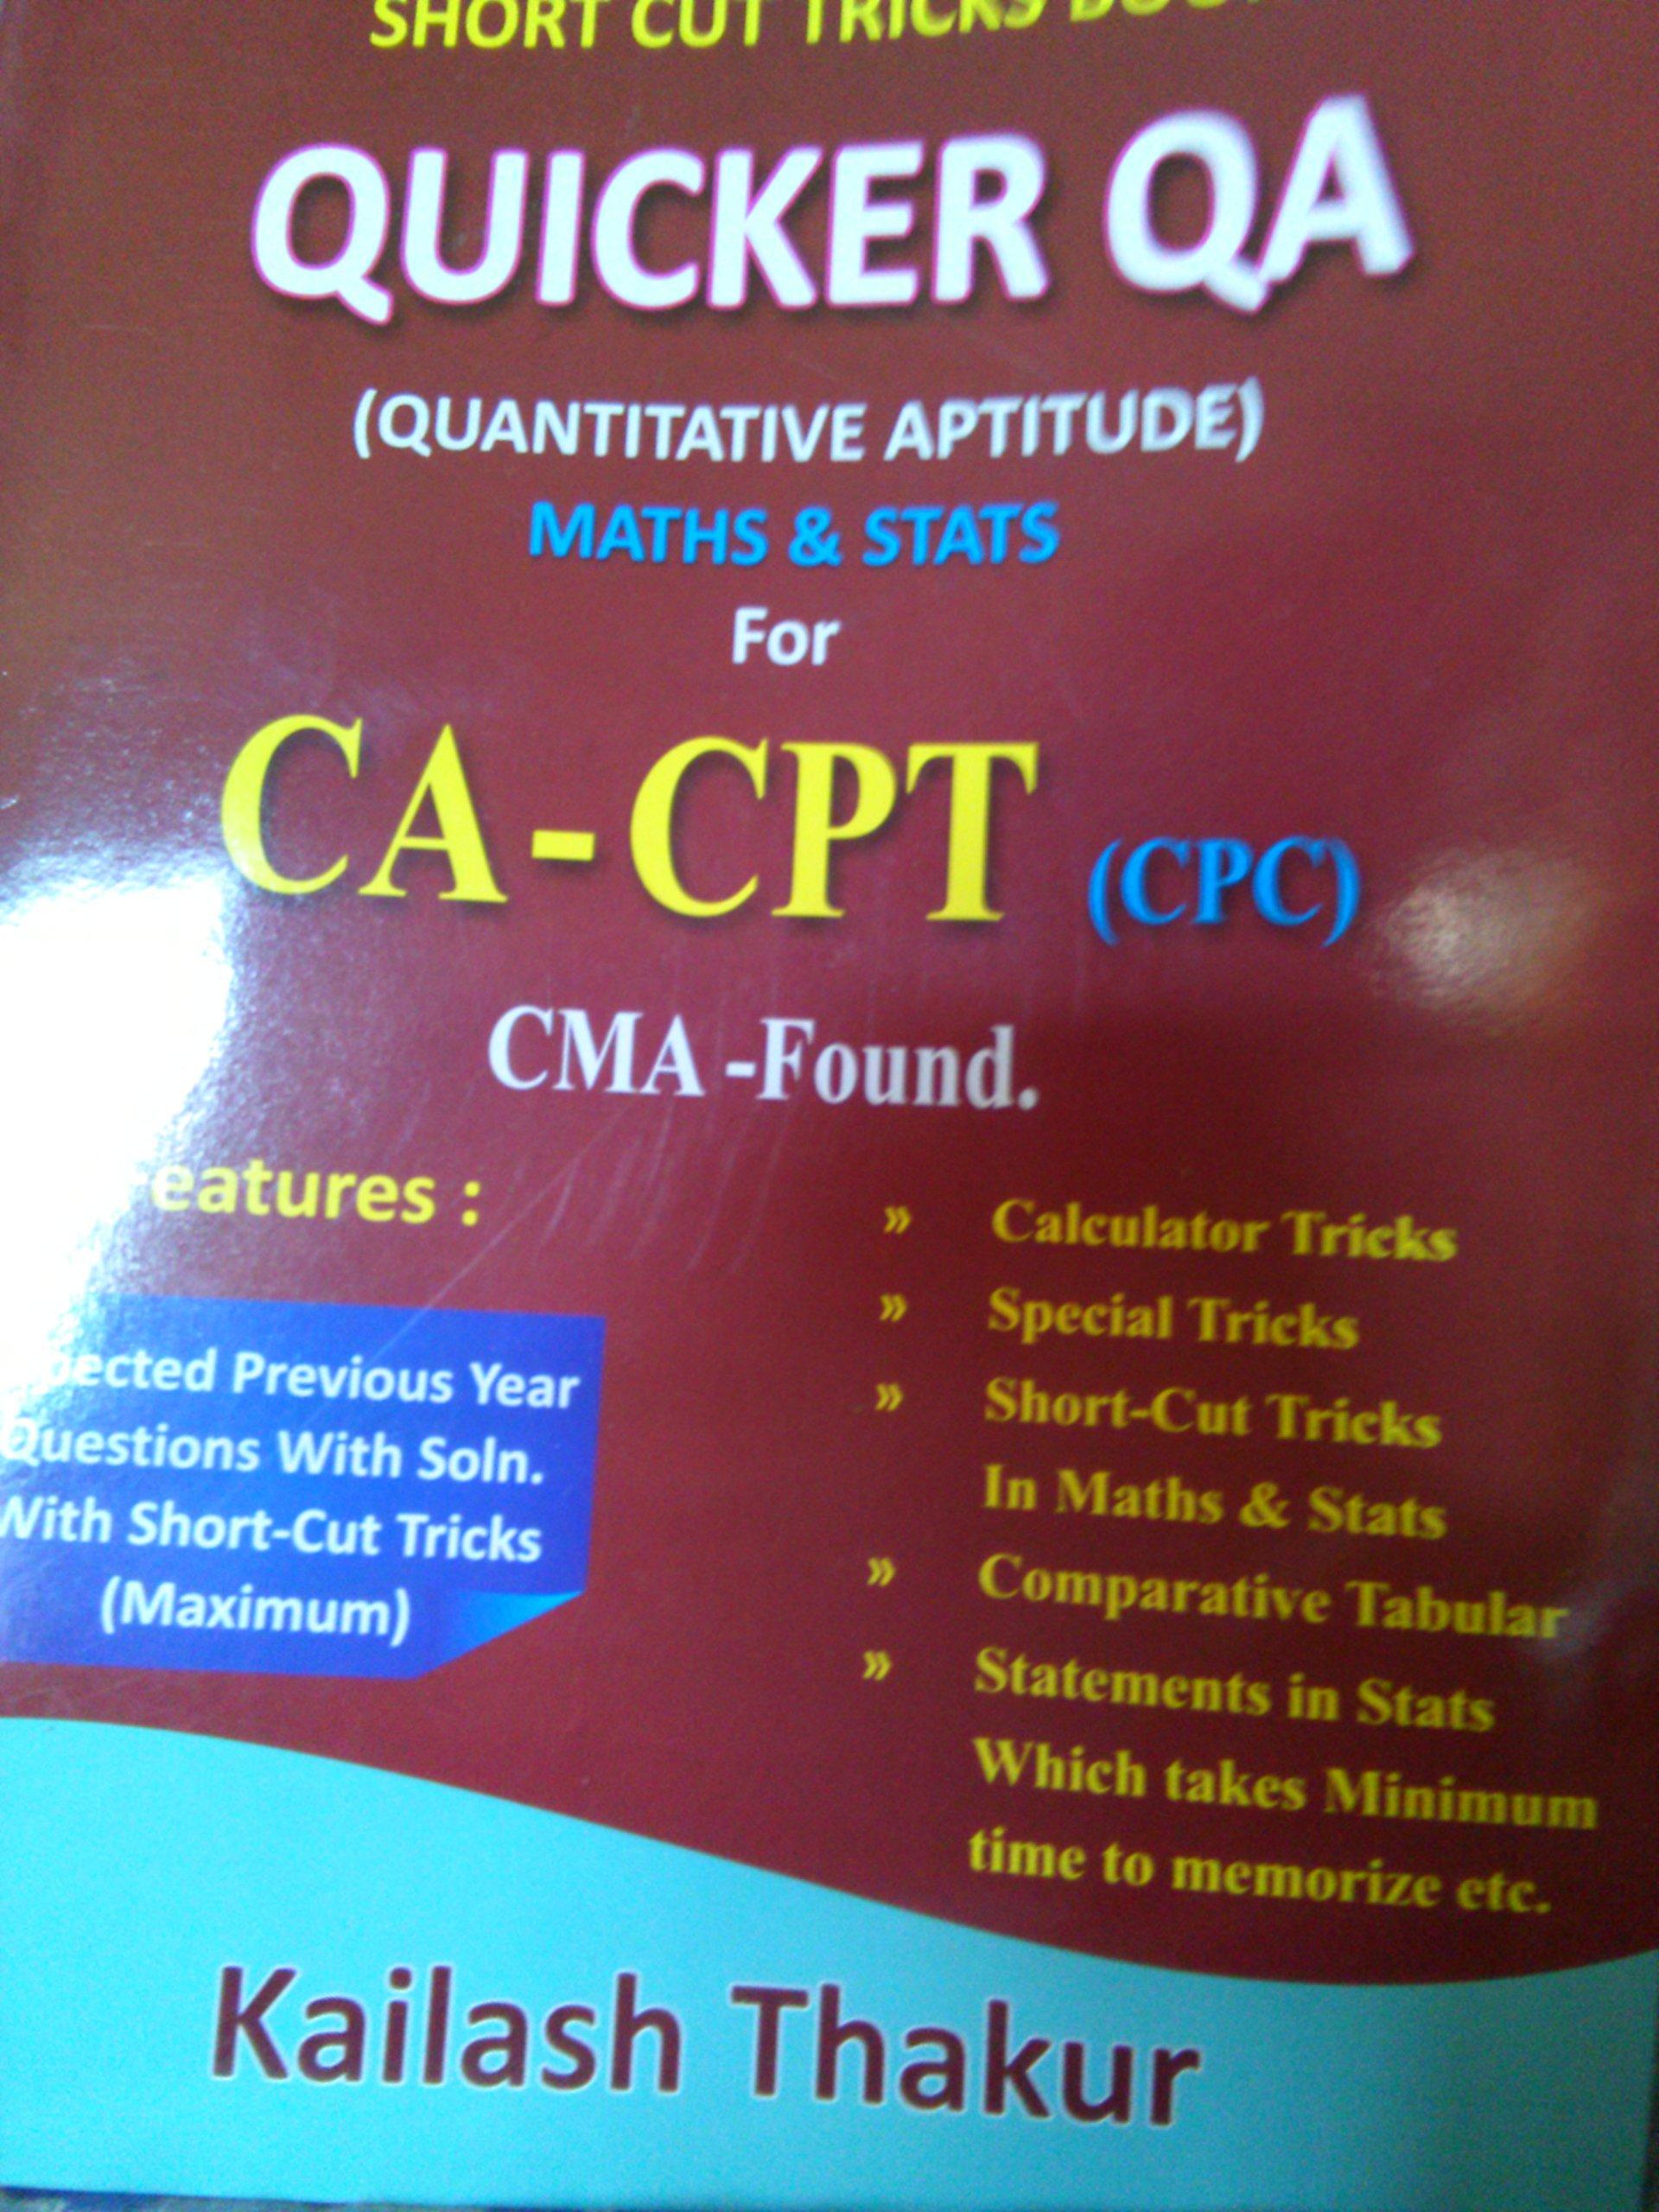 Buy short cut tricks book quicker qa for ca -cpt, cma foundation ...